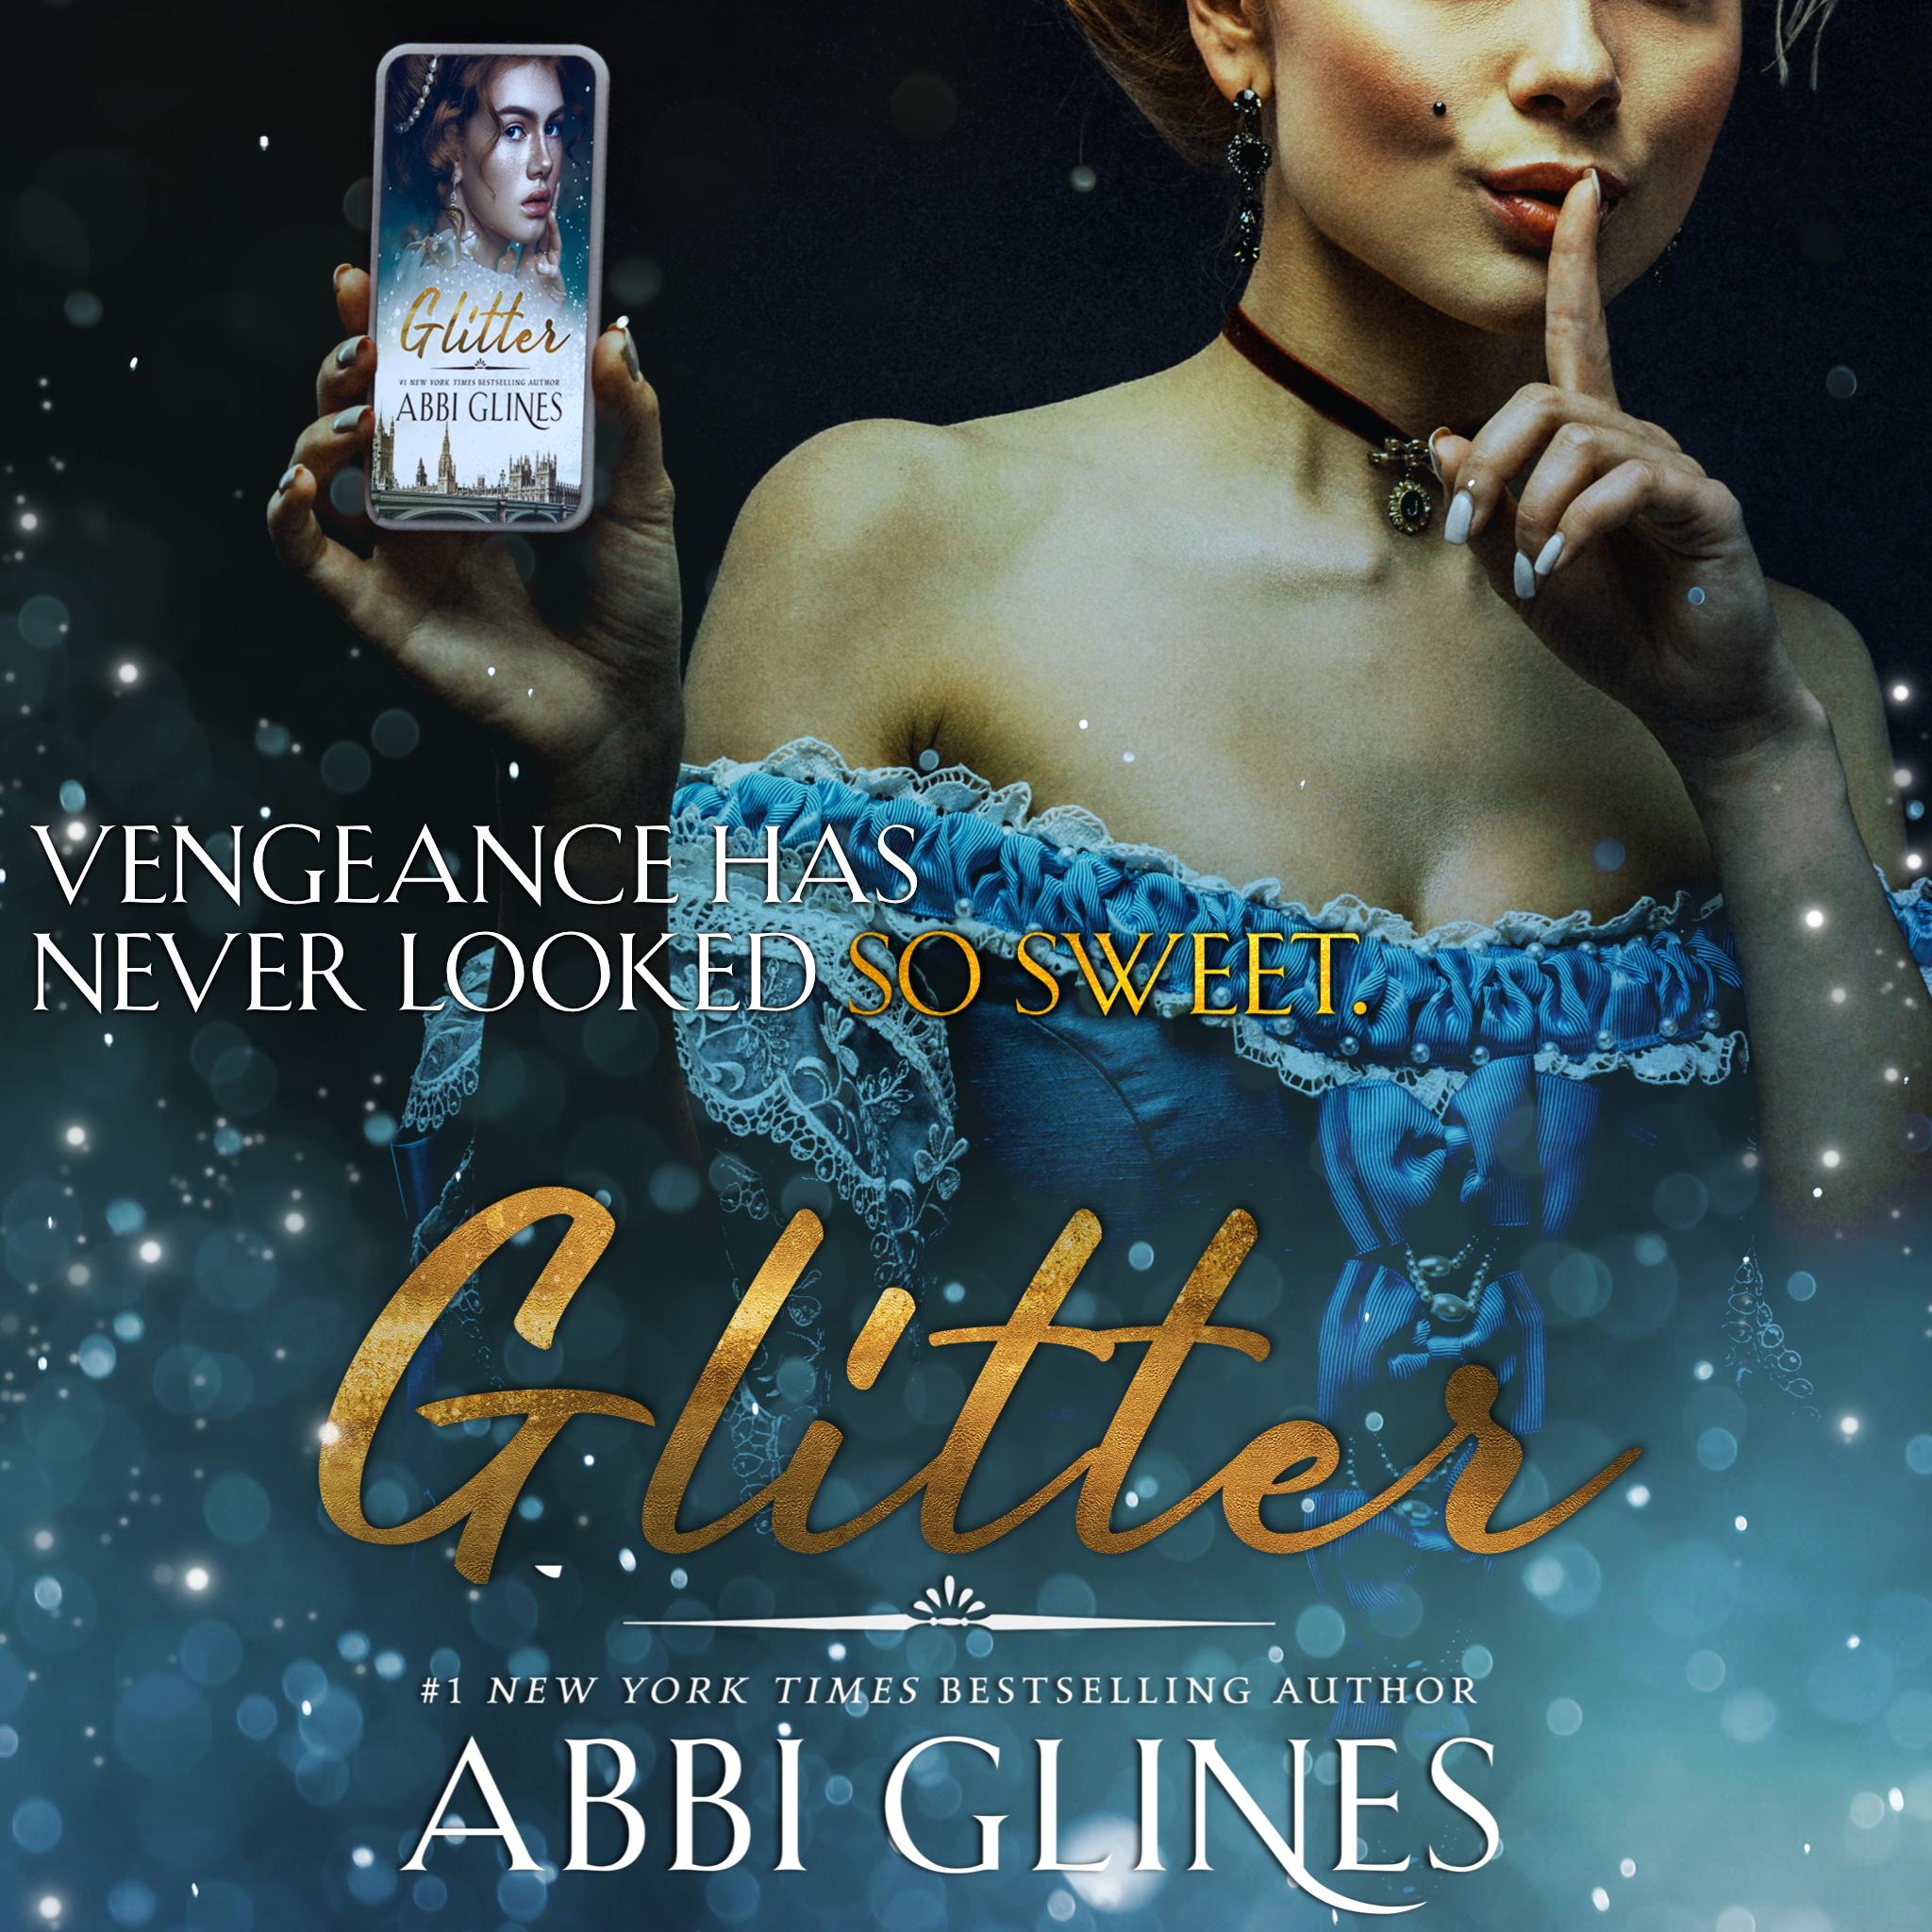 May 25th _ Release week Glitter Abbi Glines Teaser (1)